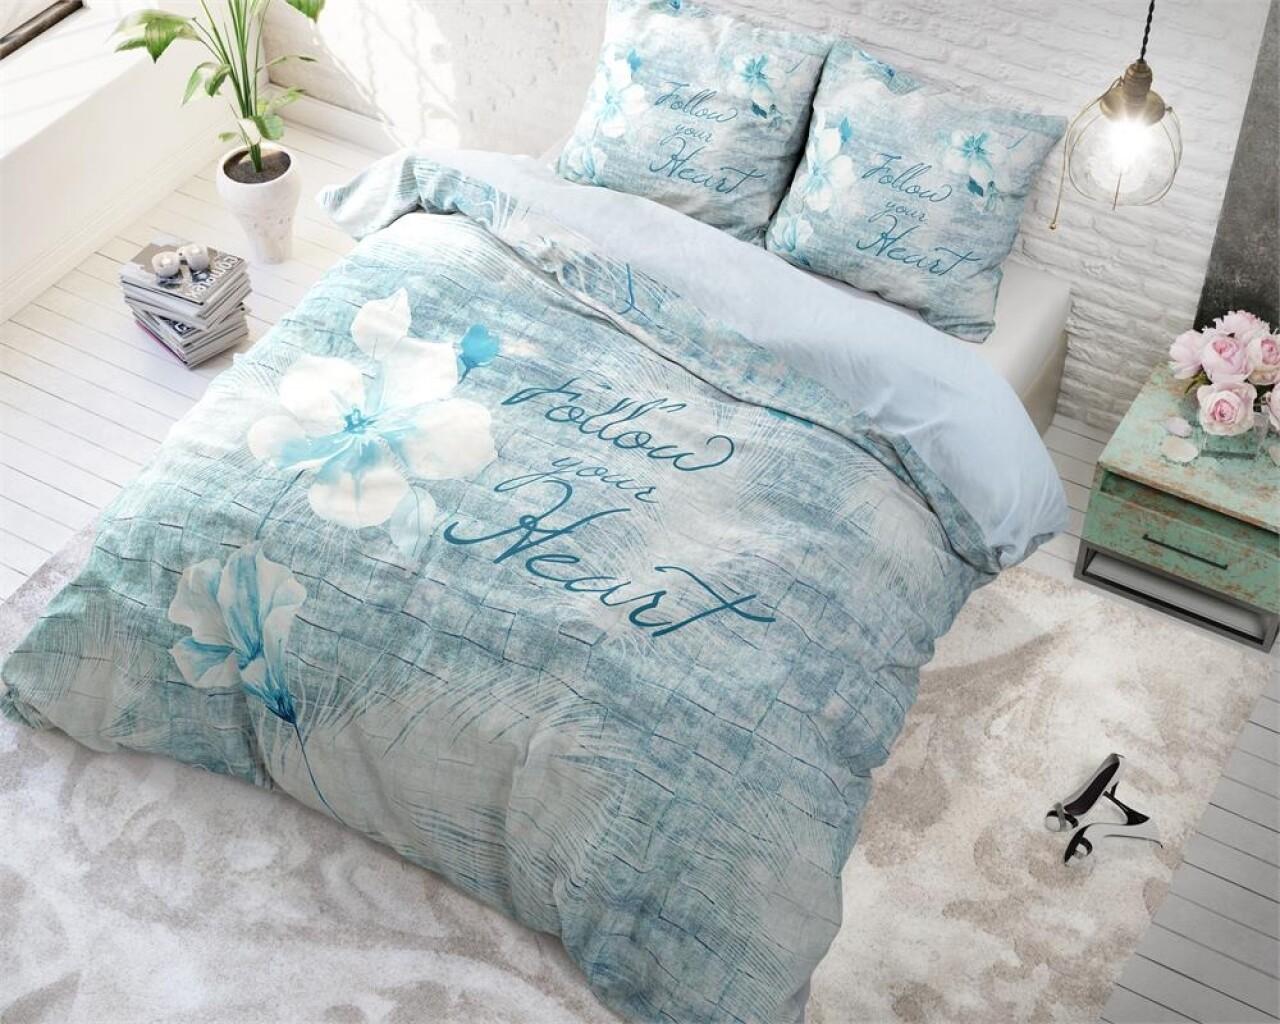 Lenjerie de pat dubla Pure Blossom 2 Turquoise, Sleeptime, 3 piese, 100% bumbac